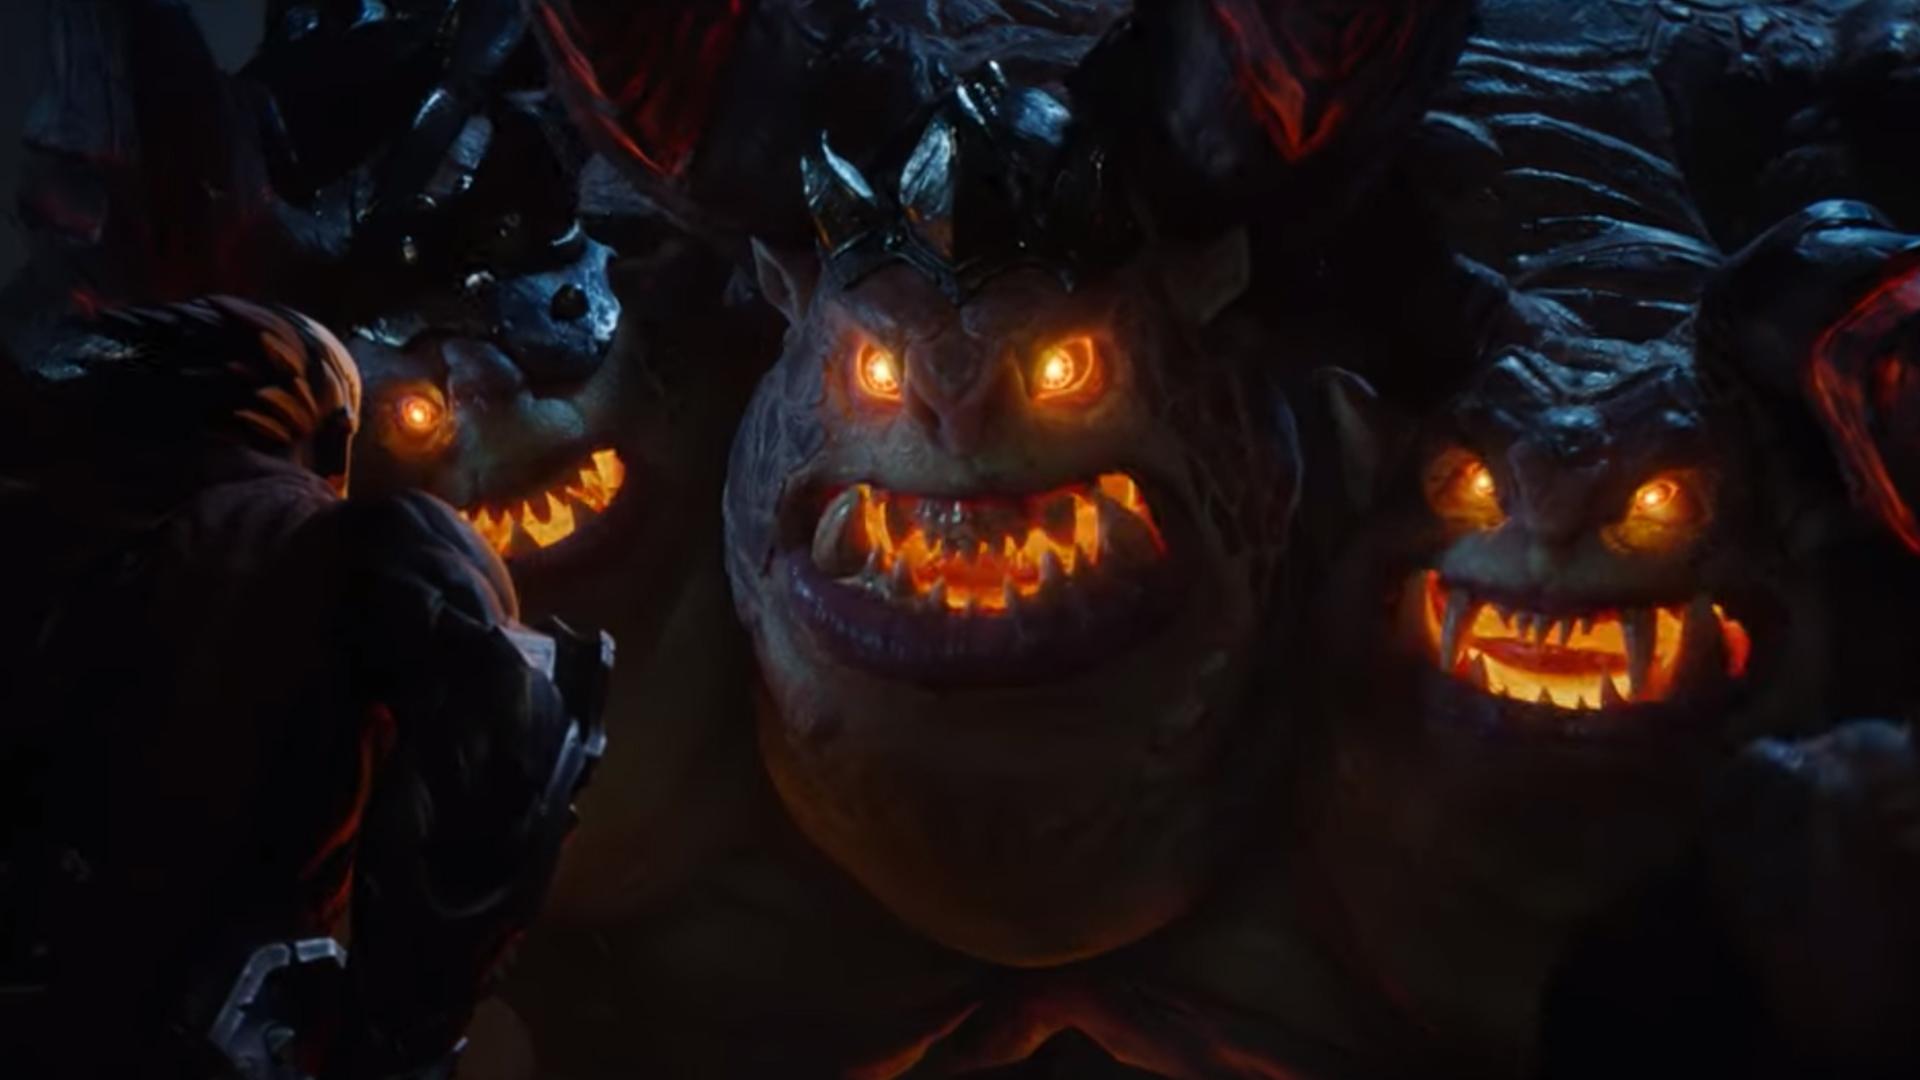 War returns in Darksiders Genesis, a prequel in the Diablo